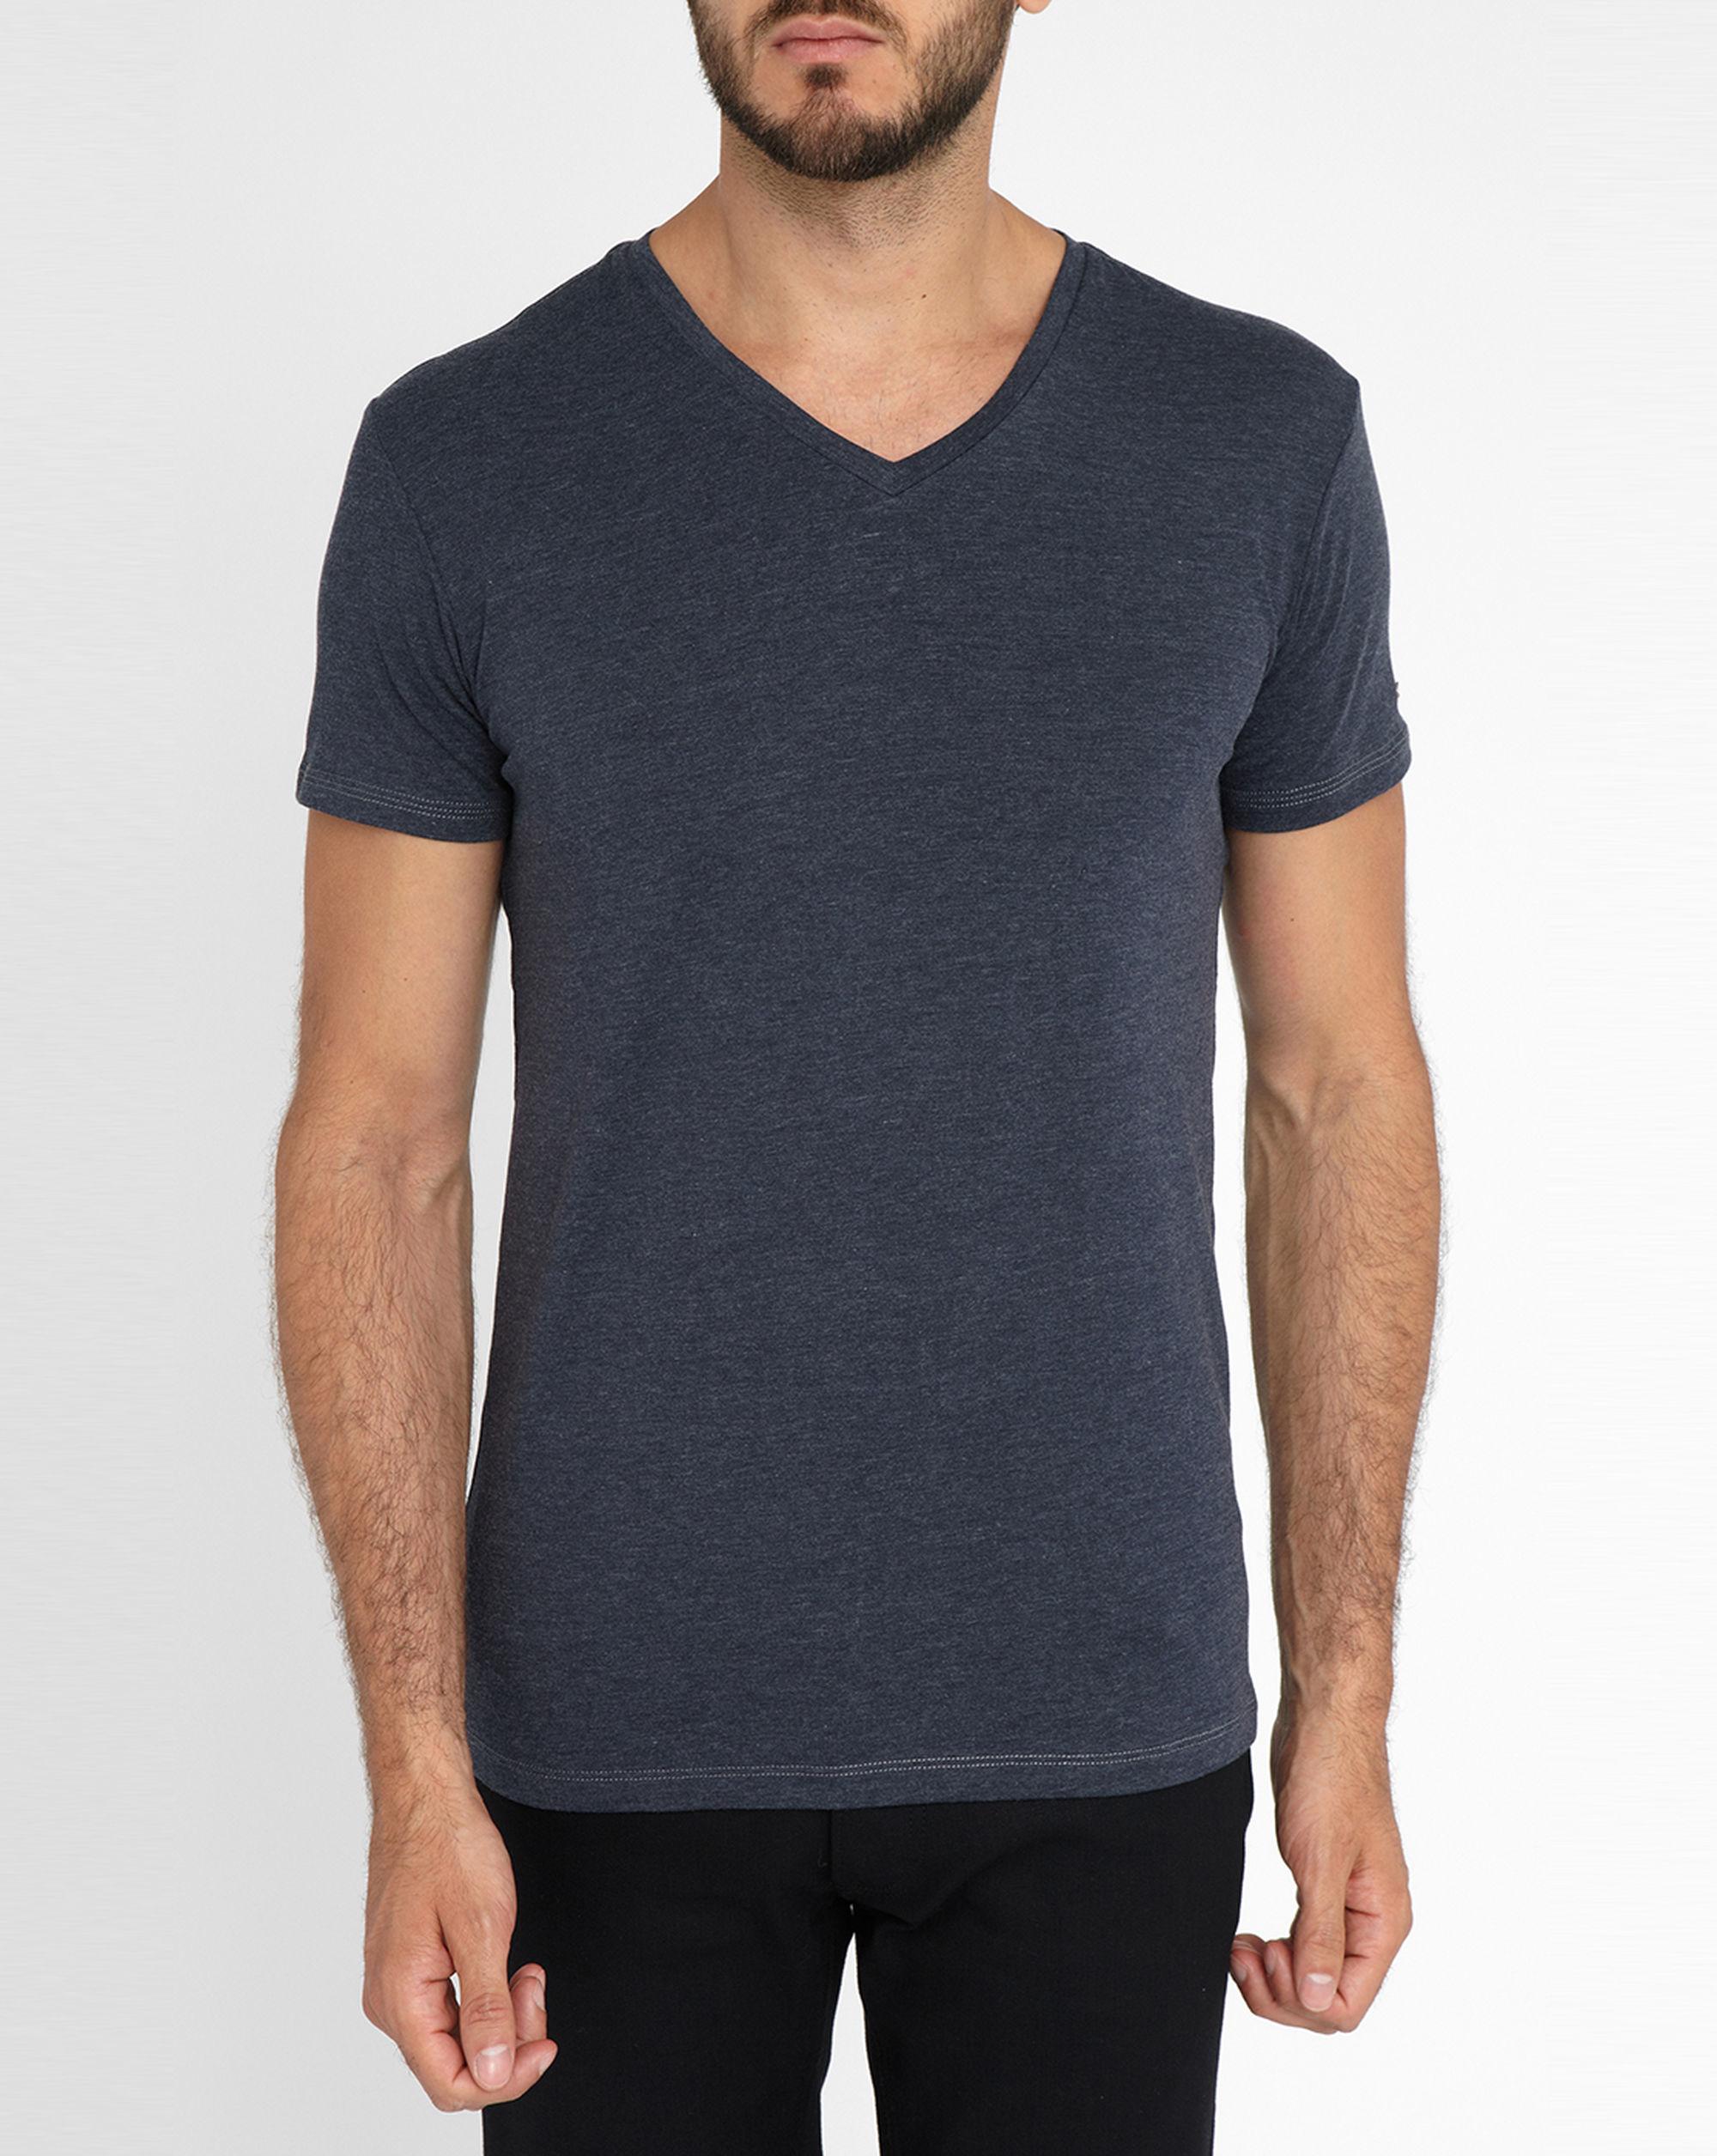 Diesel Charcoal Michael V-neck T-shirt in Gray for Men | Lyst